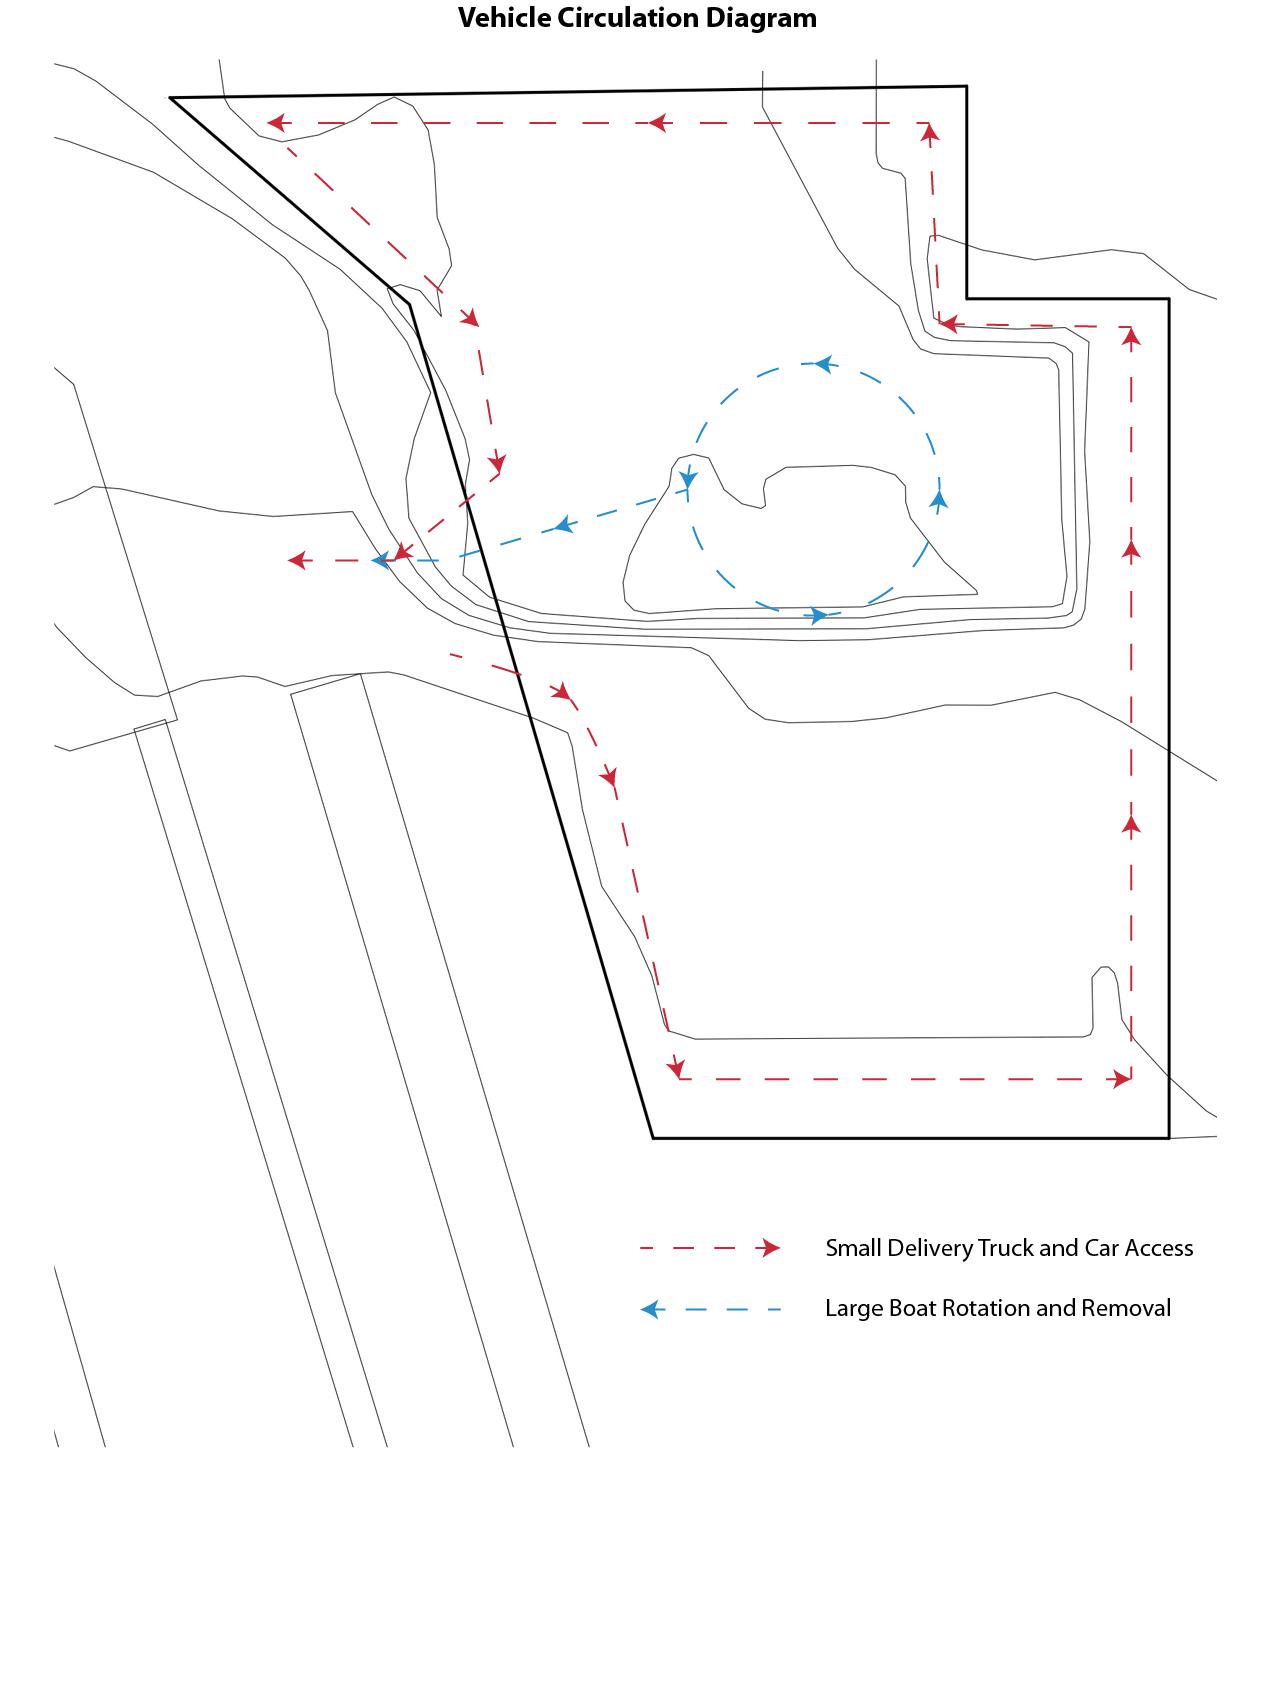 Cegavske Project 3a And 3b